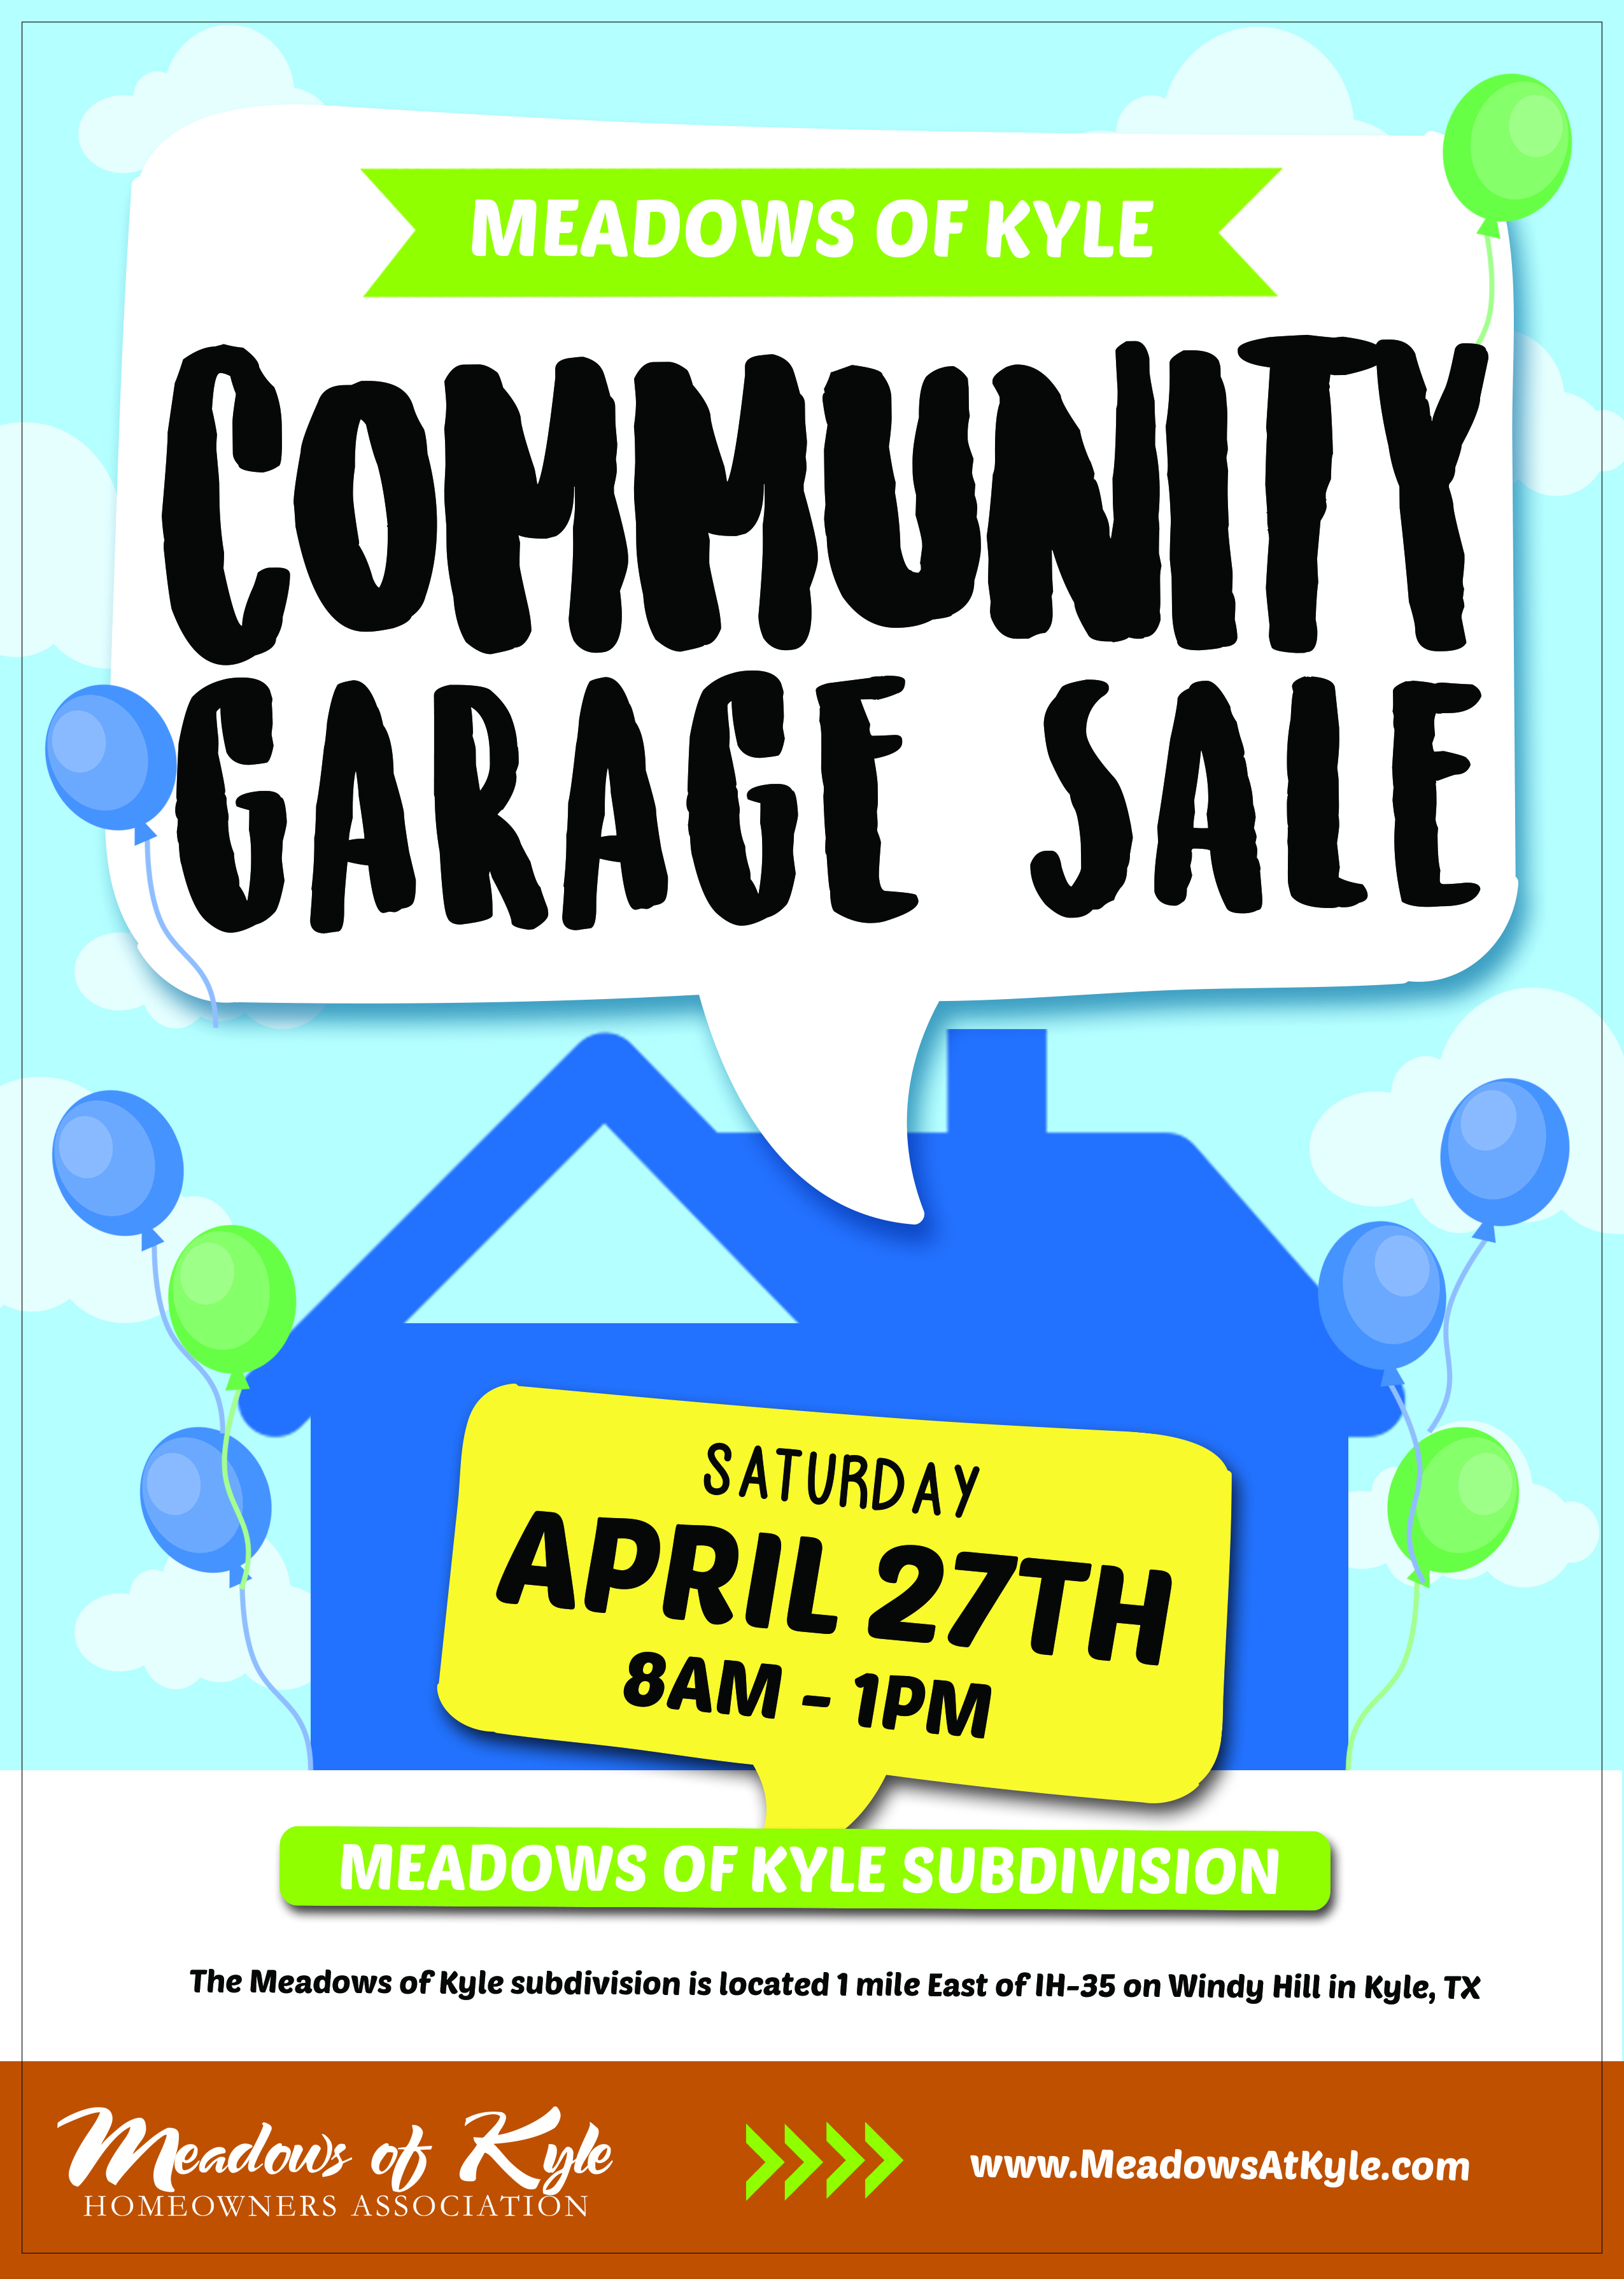 Community Garage Sale Saturday Meadows At Kyle